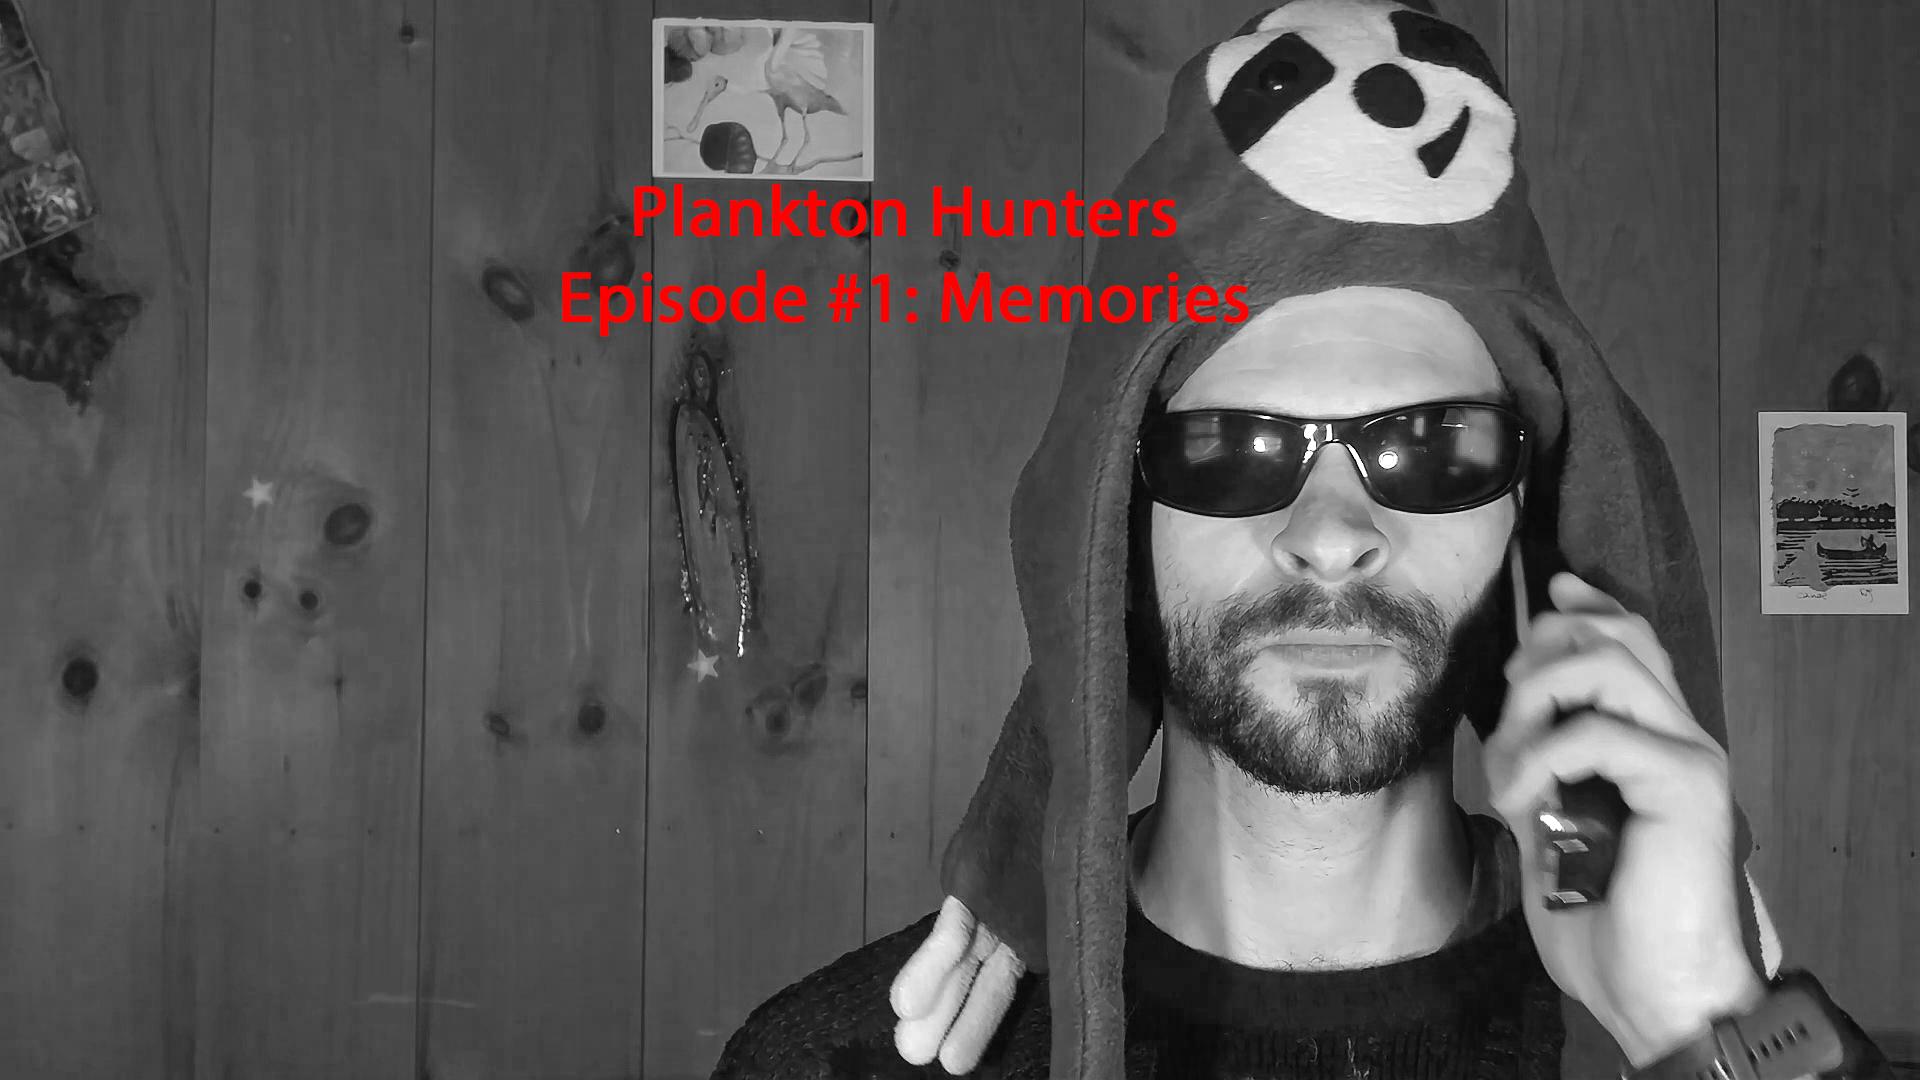 Plankton Hunters ep1 thumb.jpg